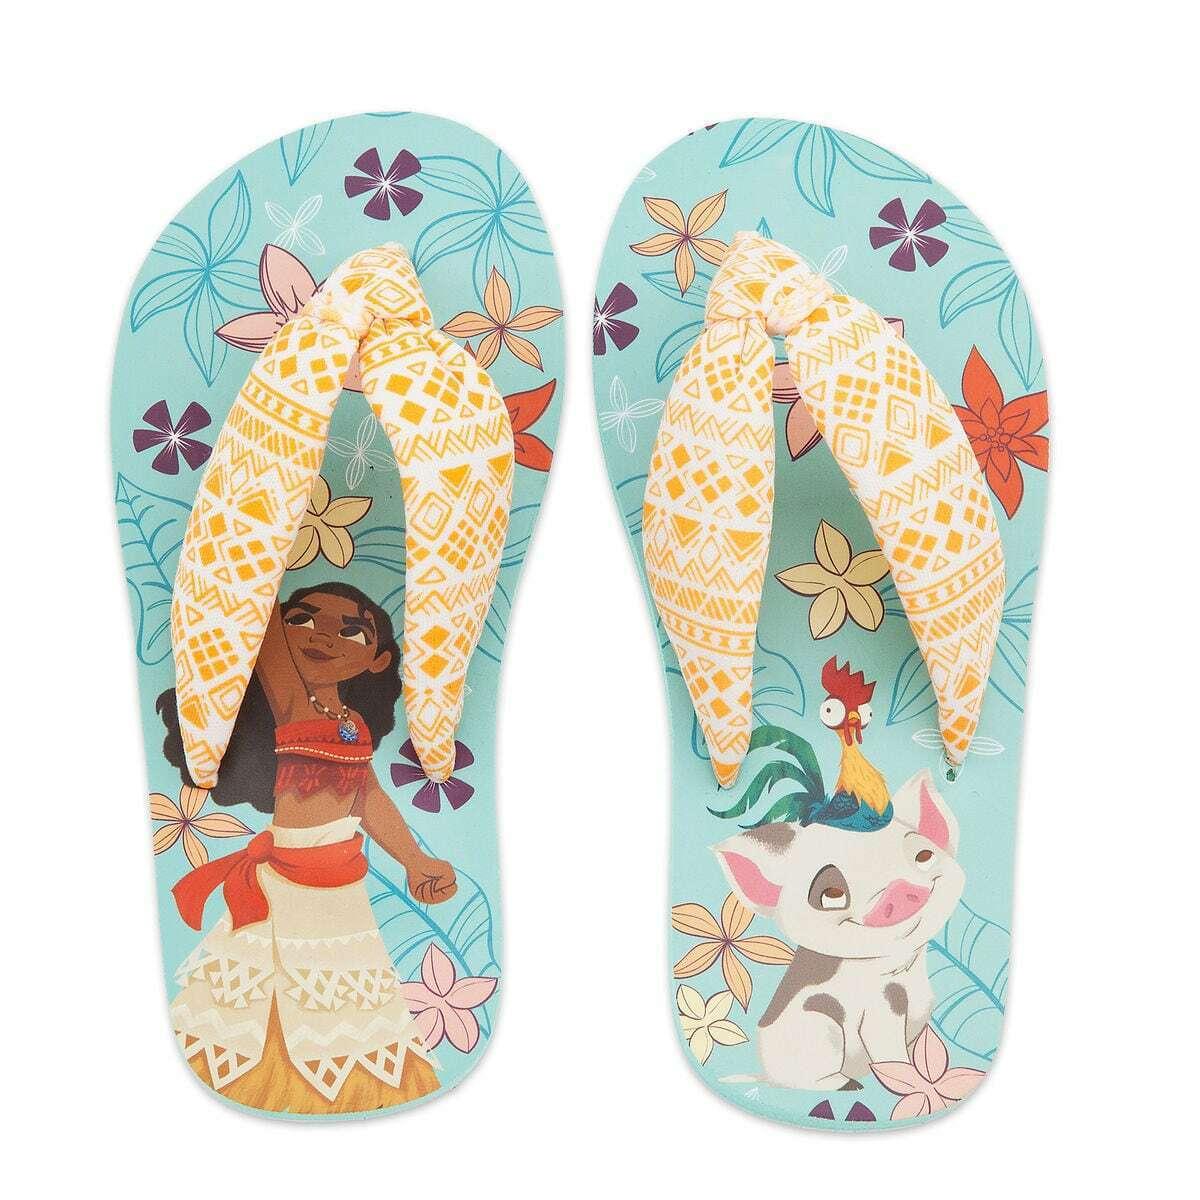 NWT Disney Store Moana Flip Flops Sandals Shoes Girls many s